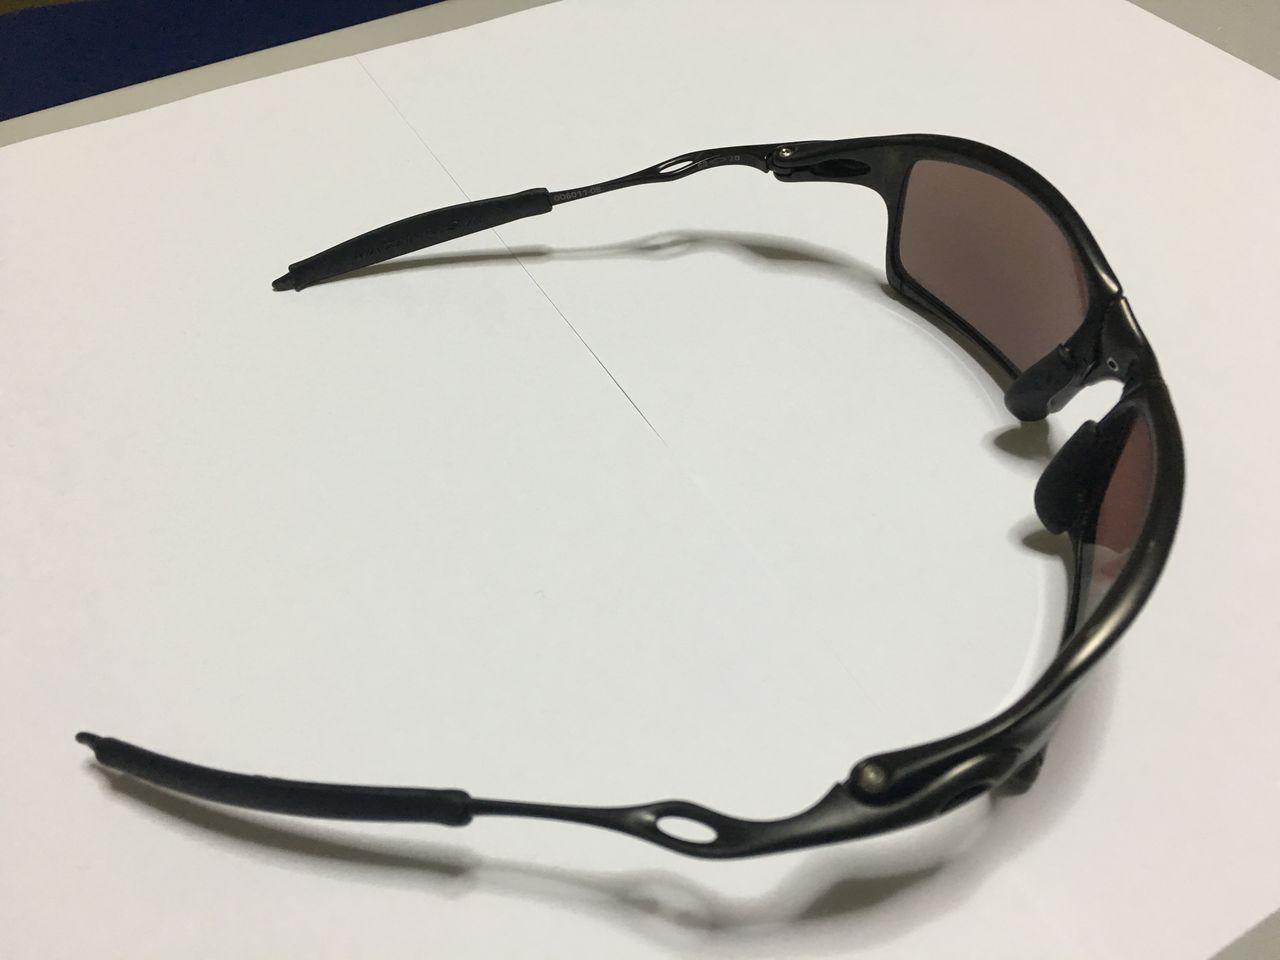 FS: Xsquared, Carbon frame OOBIP sku oo6011-08, Badman Plasma frame with Sapphire lenses - IMG_1376.jpg